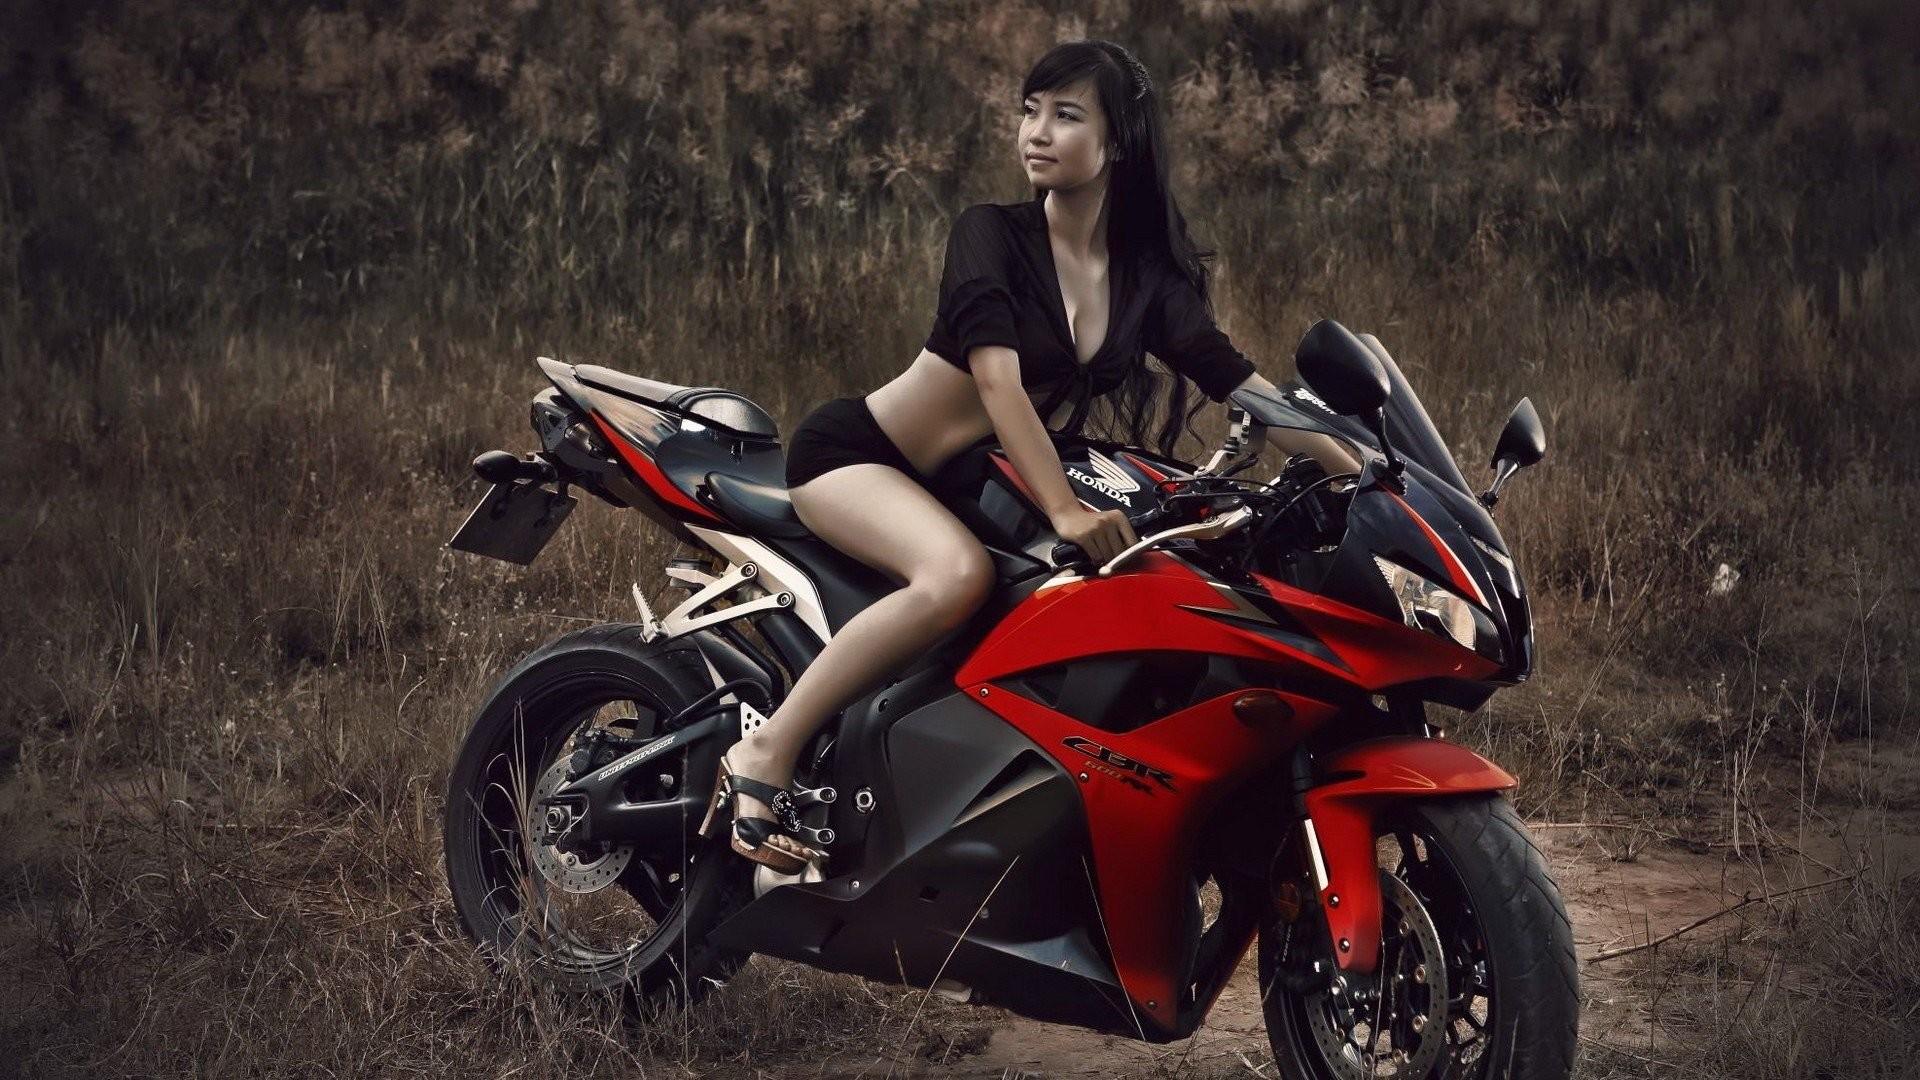 motorbike wallpapers model – Google Search